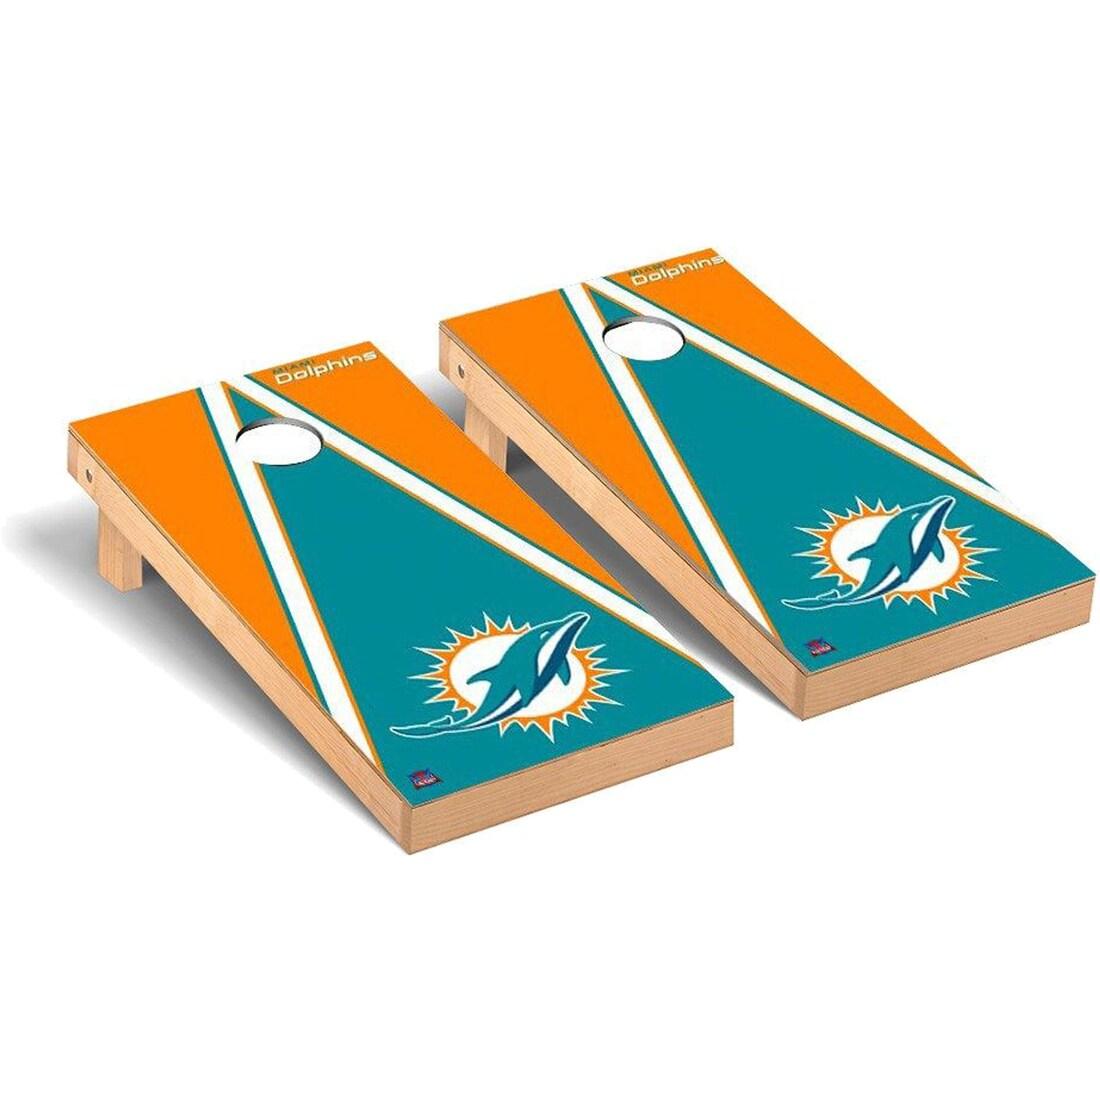 Miami Dolphins 2' x 4' Triangle Cornhole Board Tailgate Toss Set